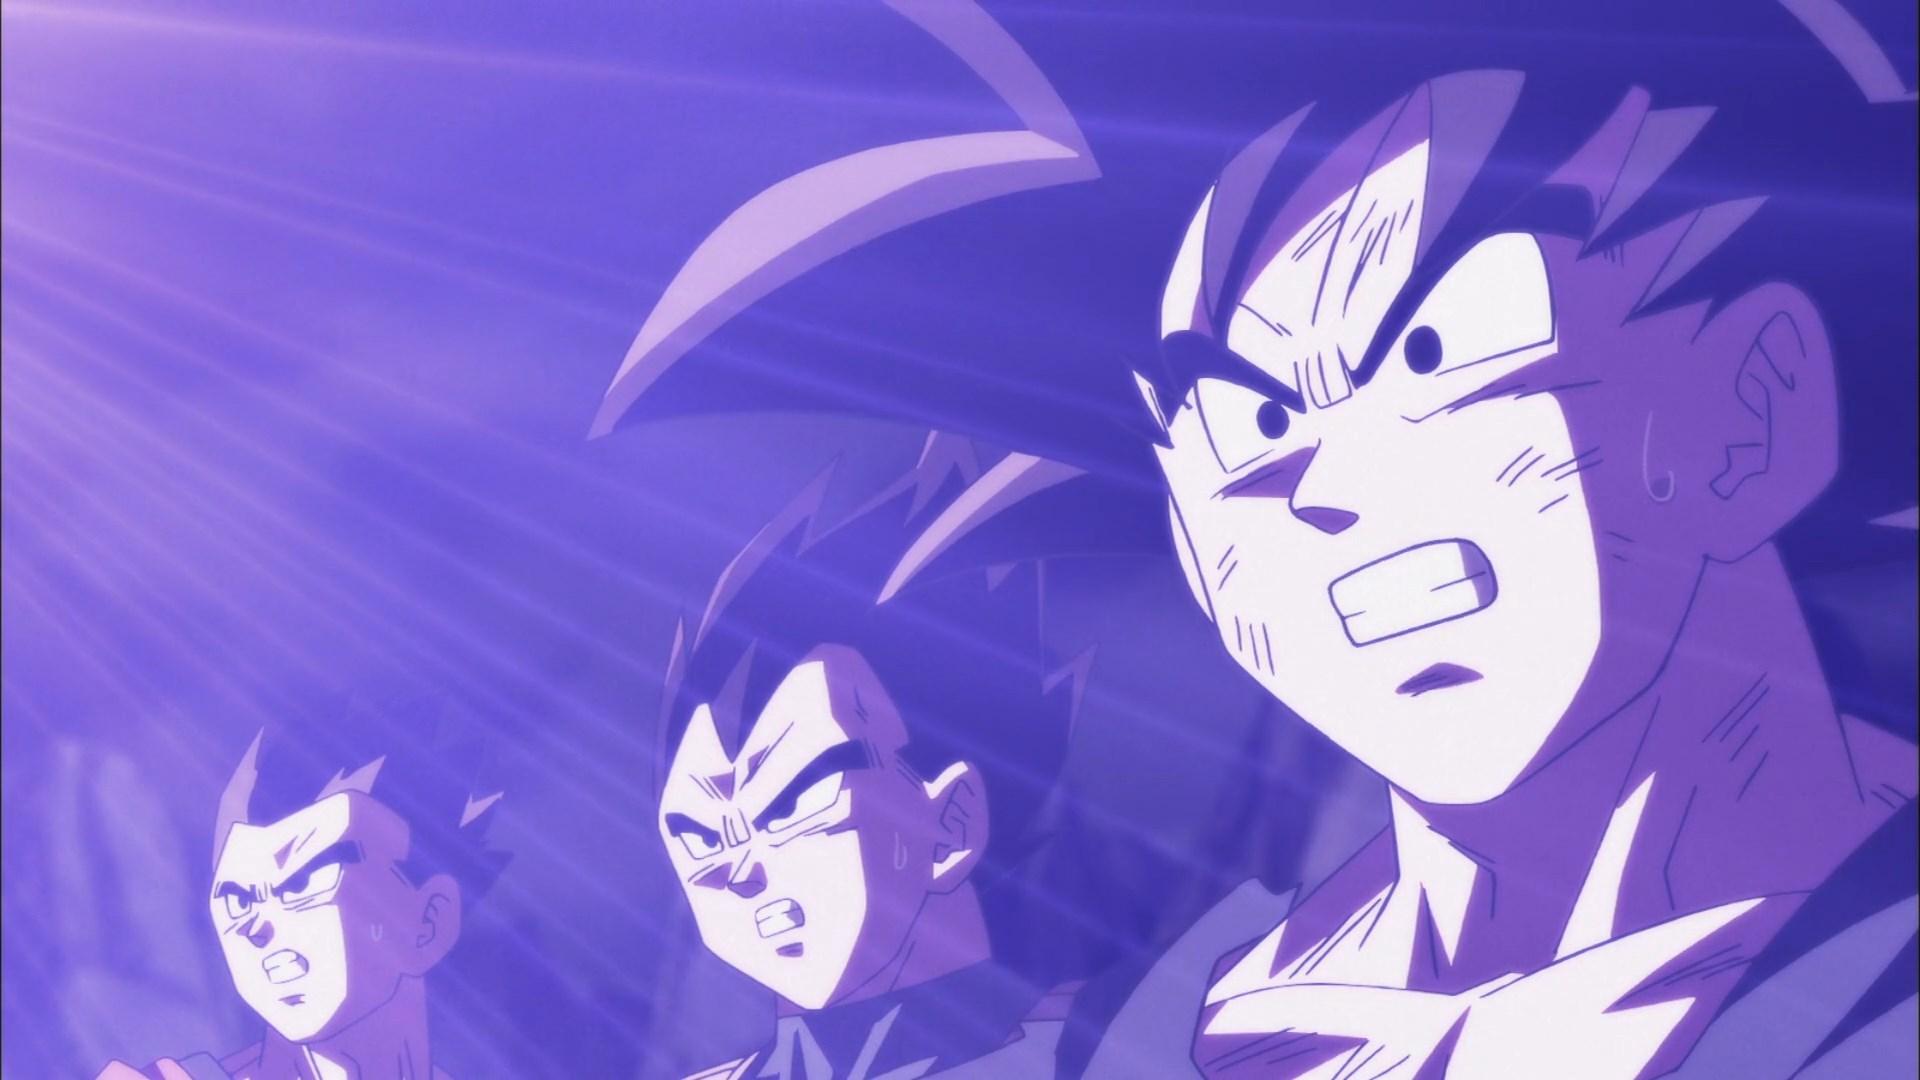 [HorribleSubs] Dragon Ball Super - 121 [1080p].mkv_snapshot_04.08